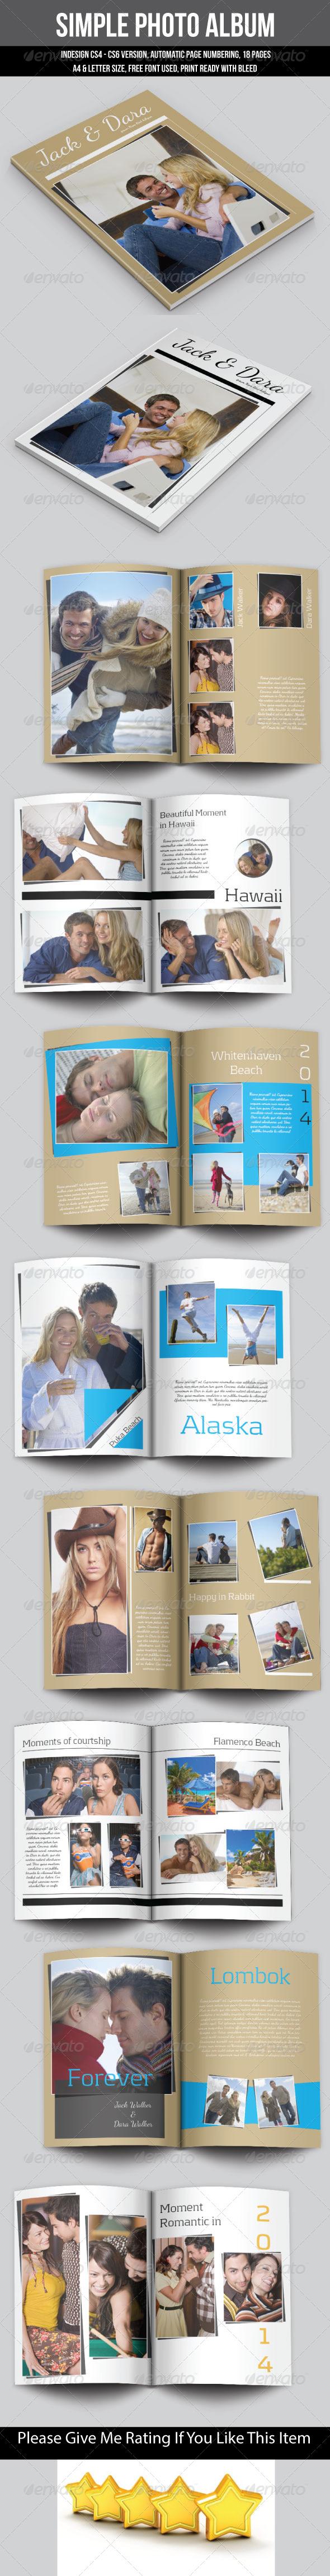 Simple Photo Album - Photo Albums Print Templates